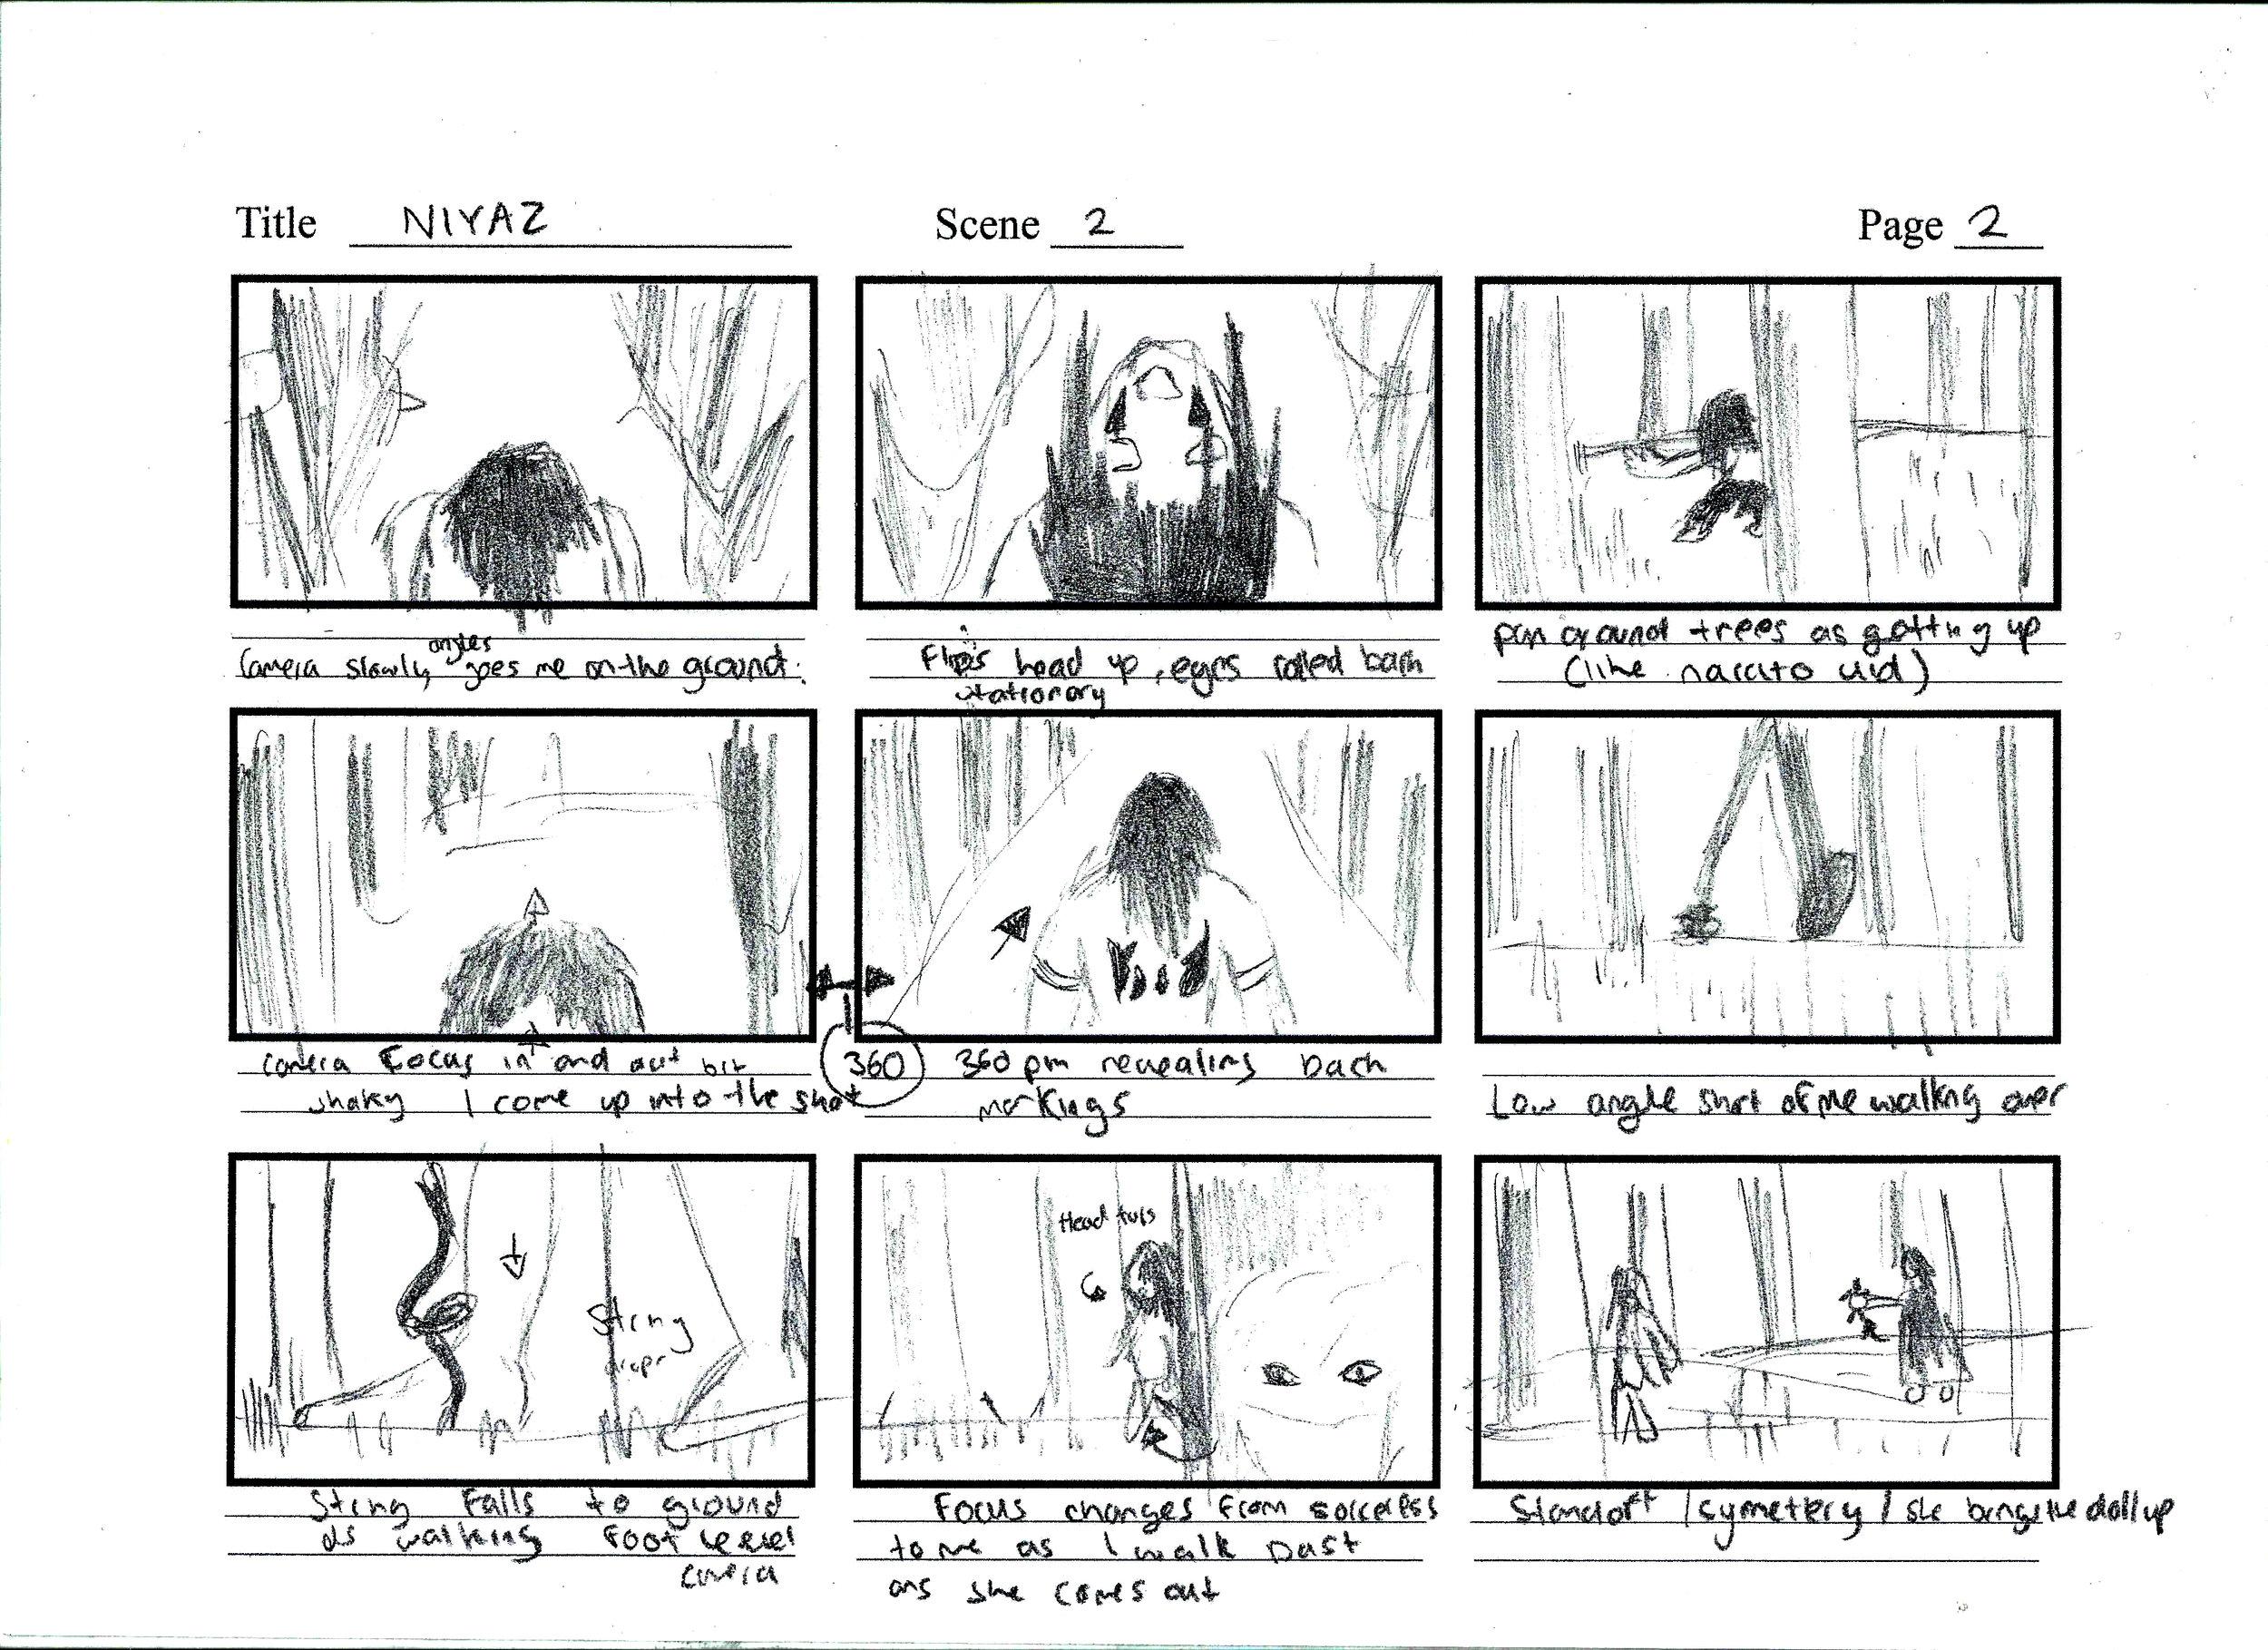 niyaz storyboard 2.jpg